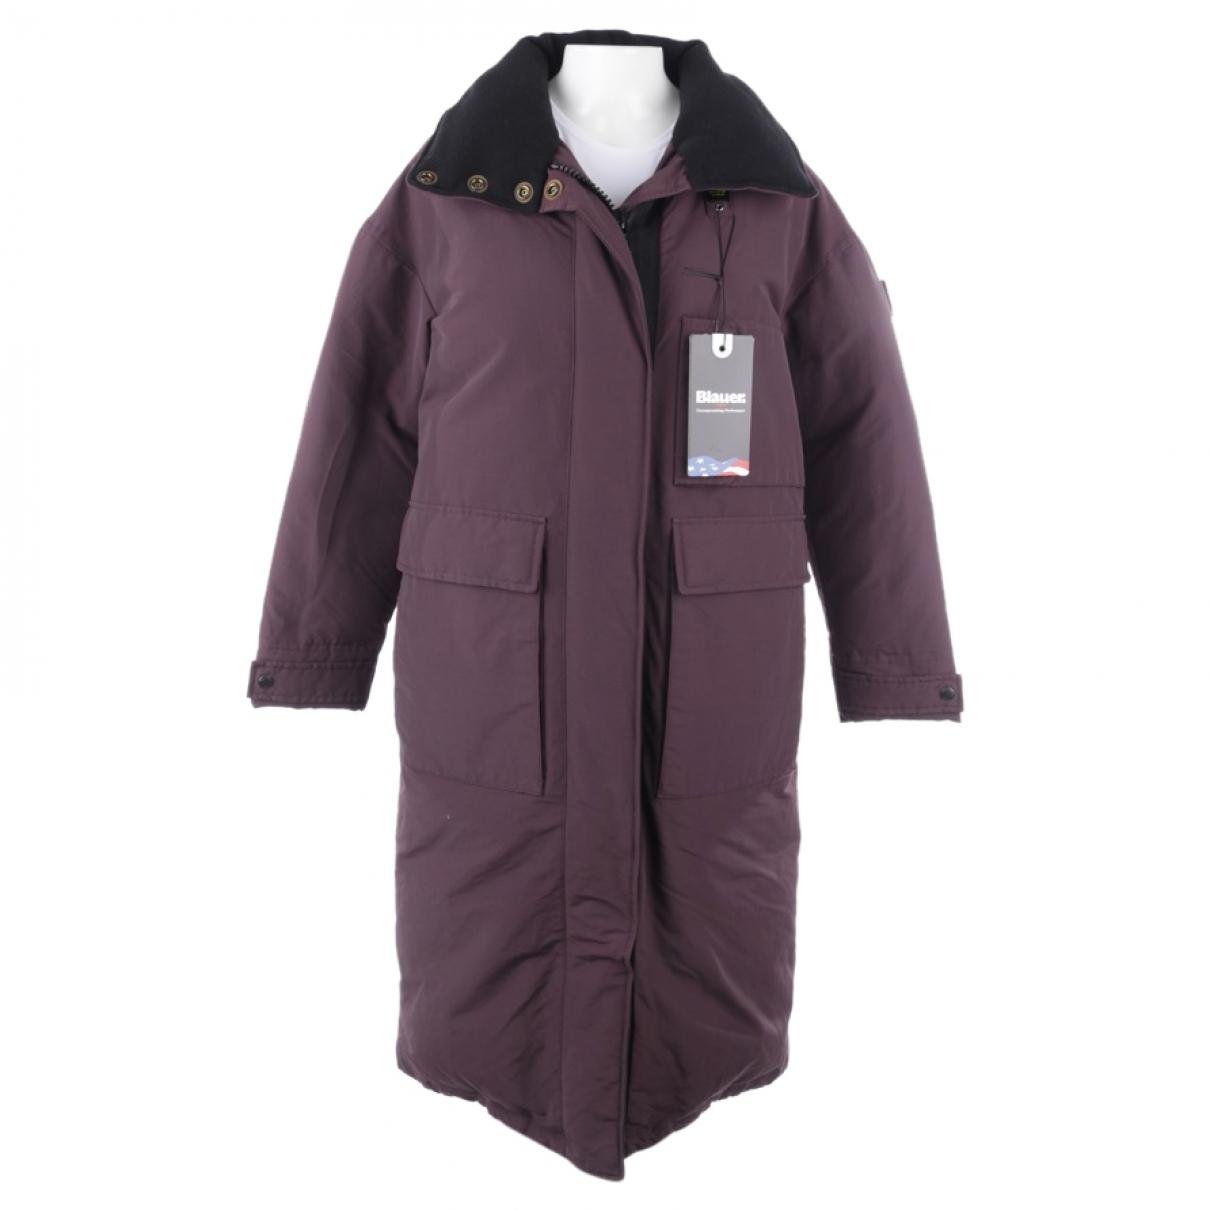 Blauer \N Grey jacket for Women M International